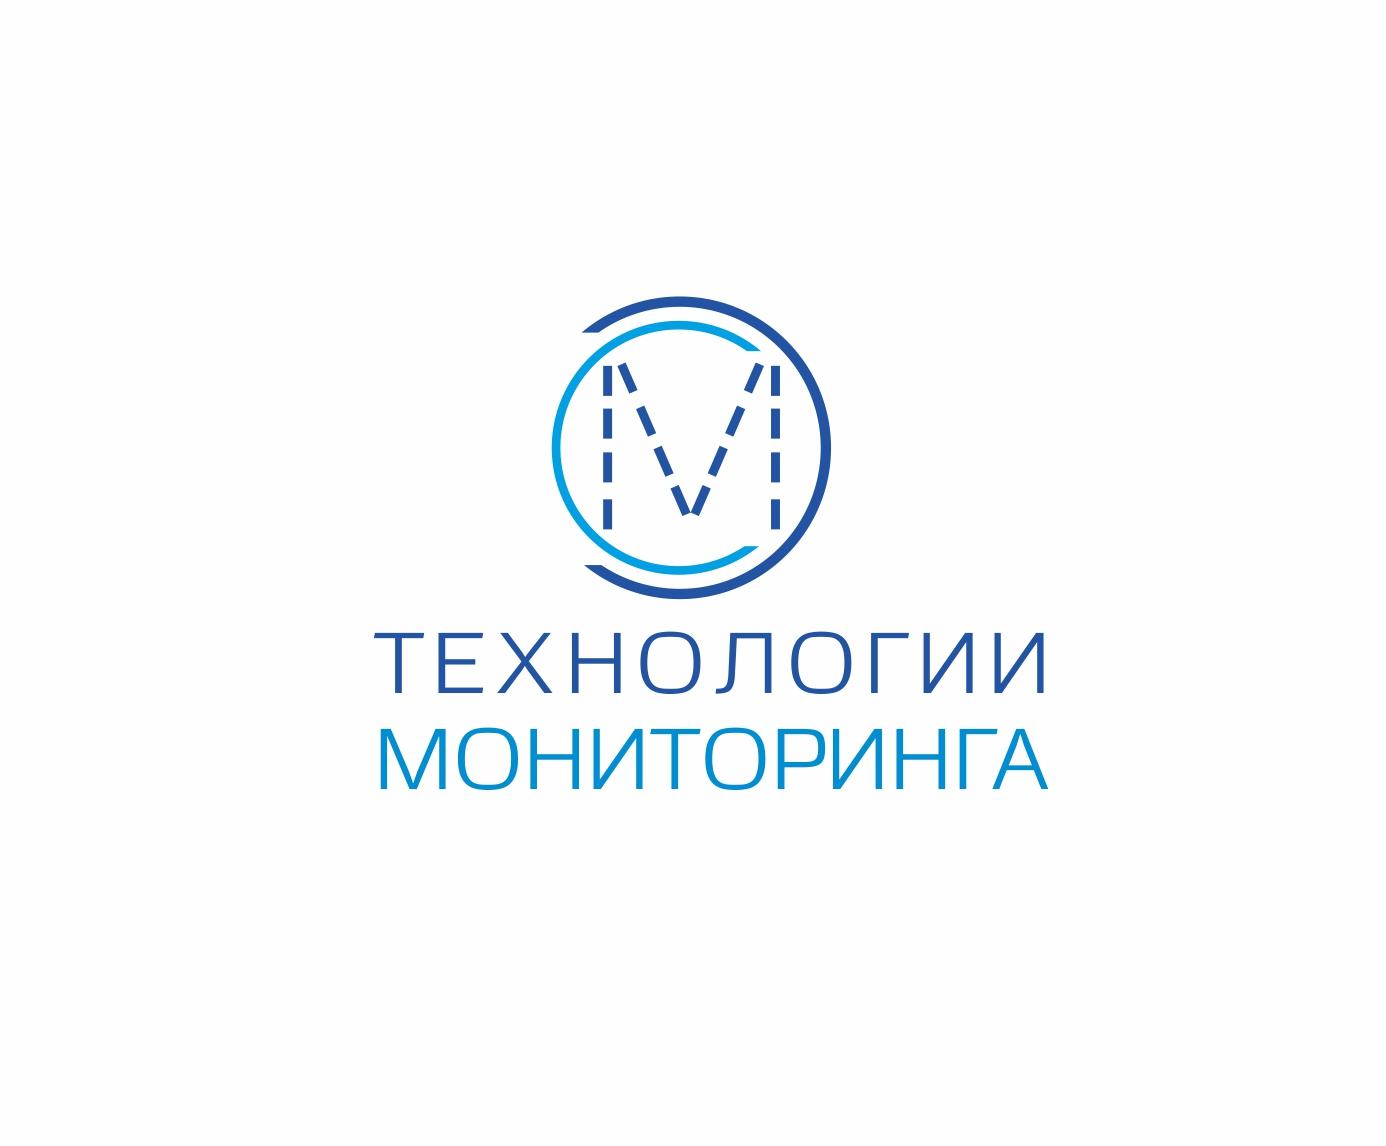 Разработка логотипа фото f_432596dc89dd4d02.jpg